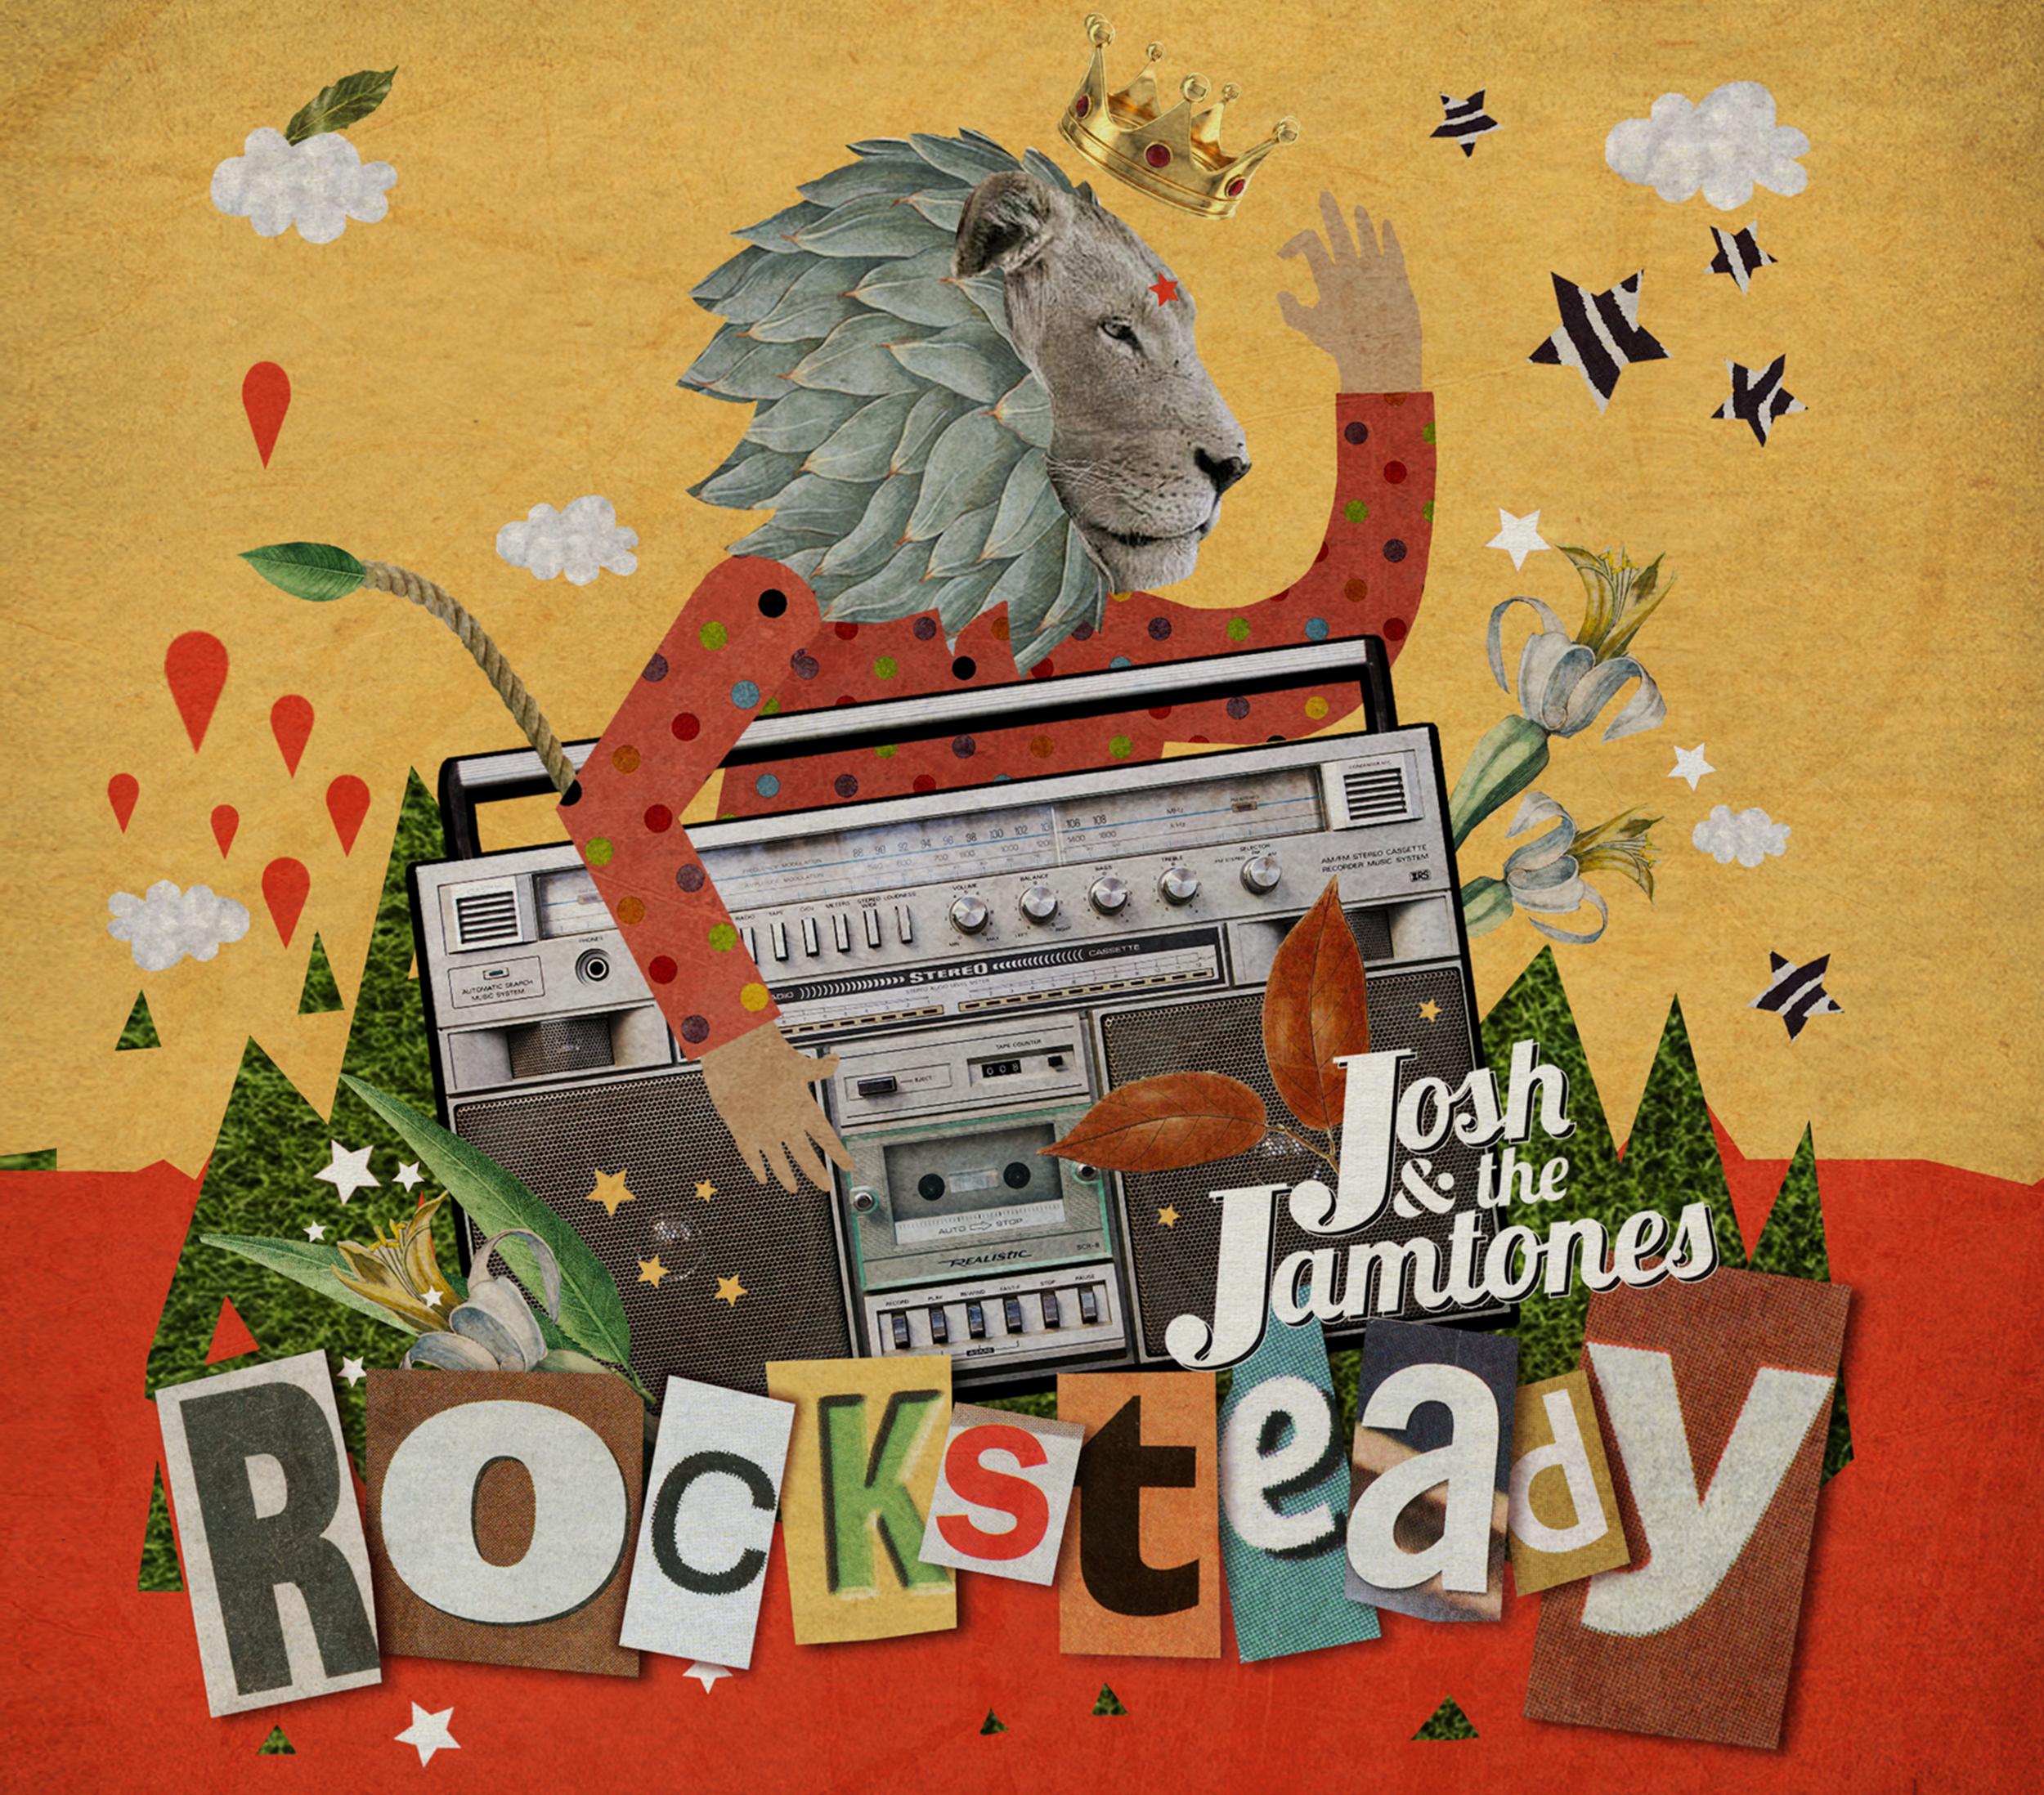 ROCKSTEADY (2015)